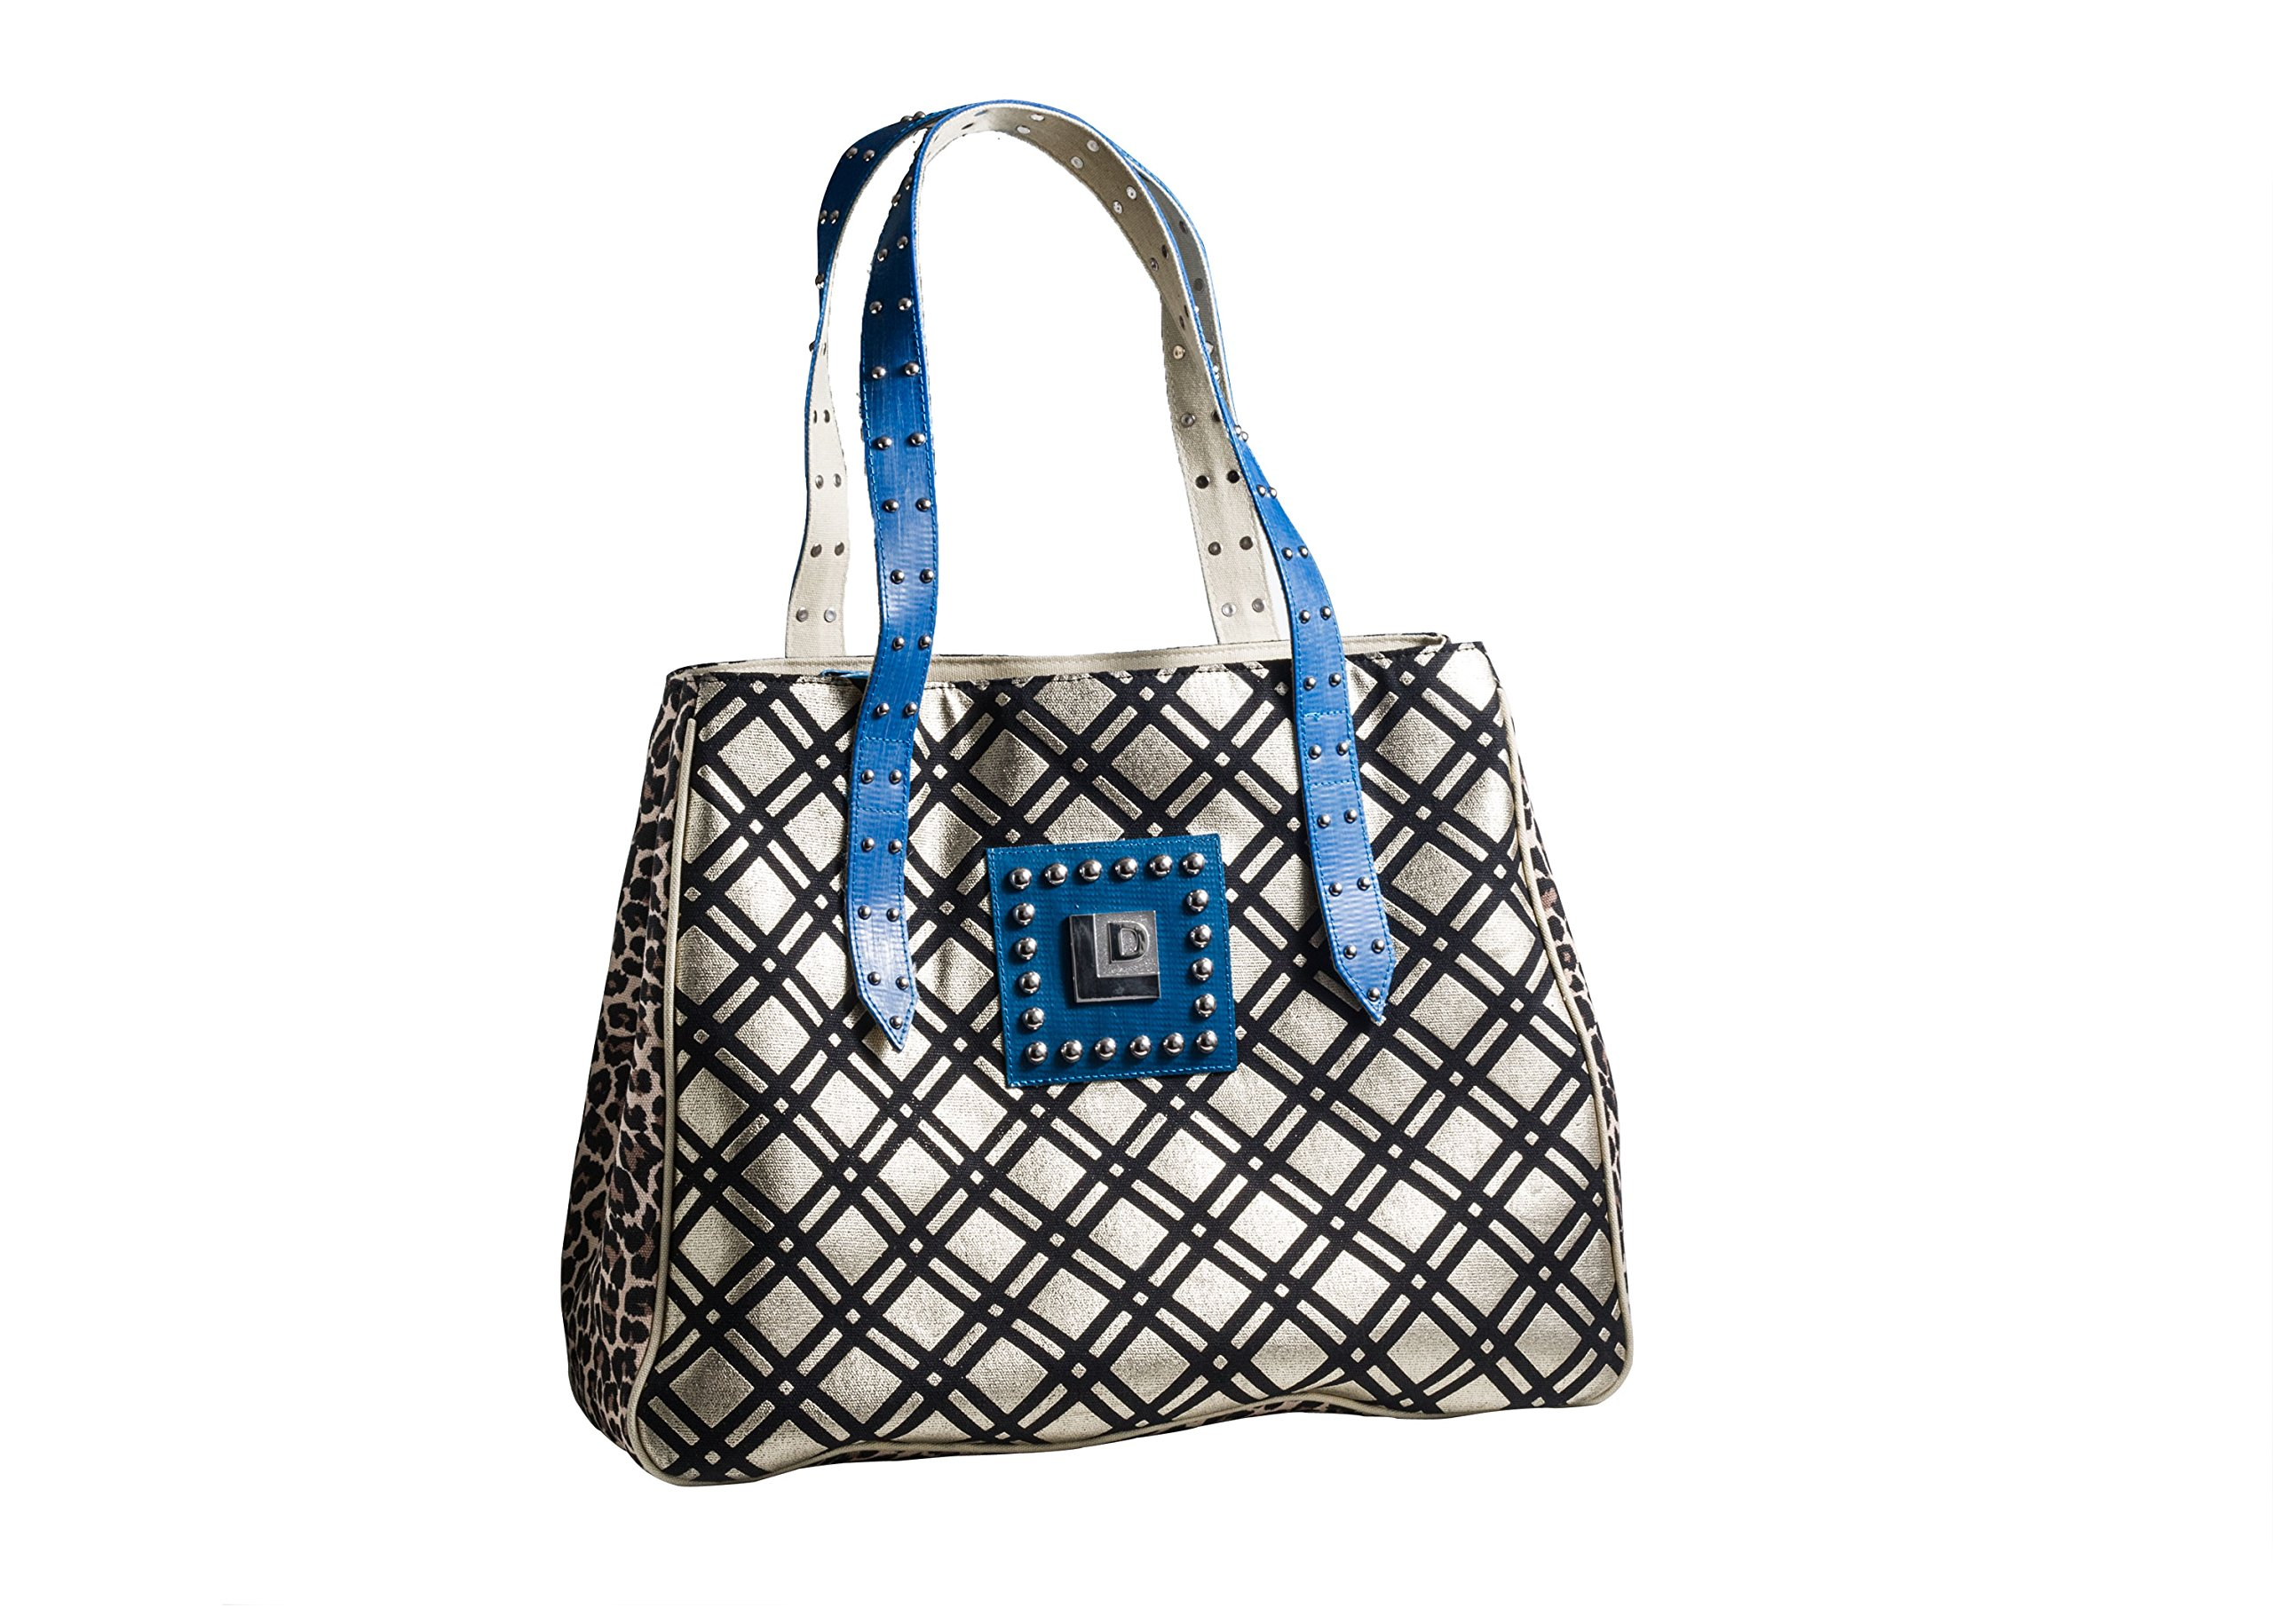 Landfill Dzine Plaid Leopard Print Recycled Handbags